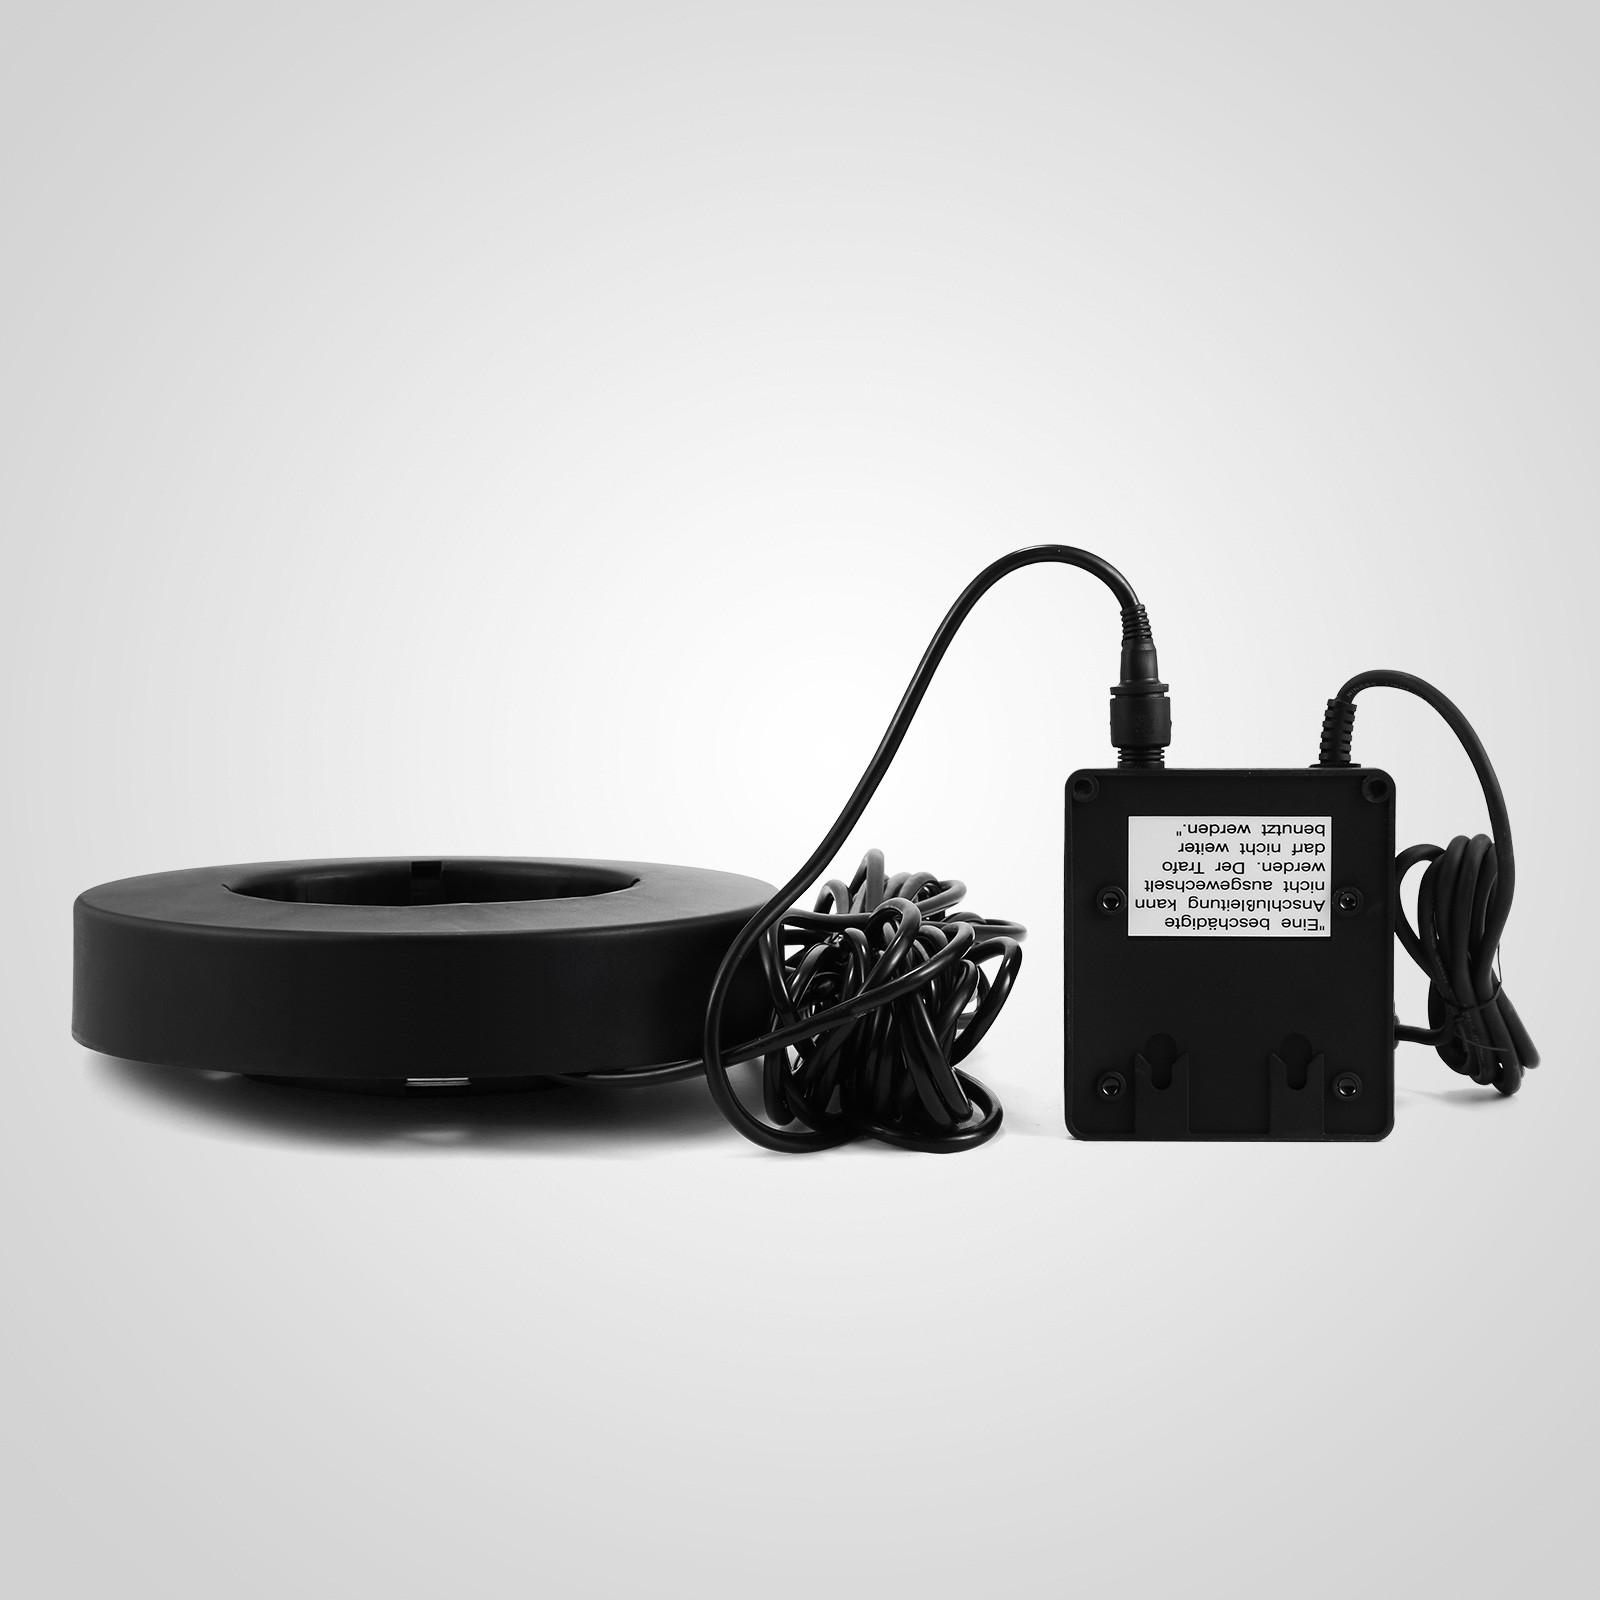 12 Head Ultrasonic Mist Maker Humidificateur /& Flotteur Téflon Disques Nutramist Fogger